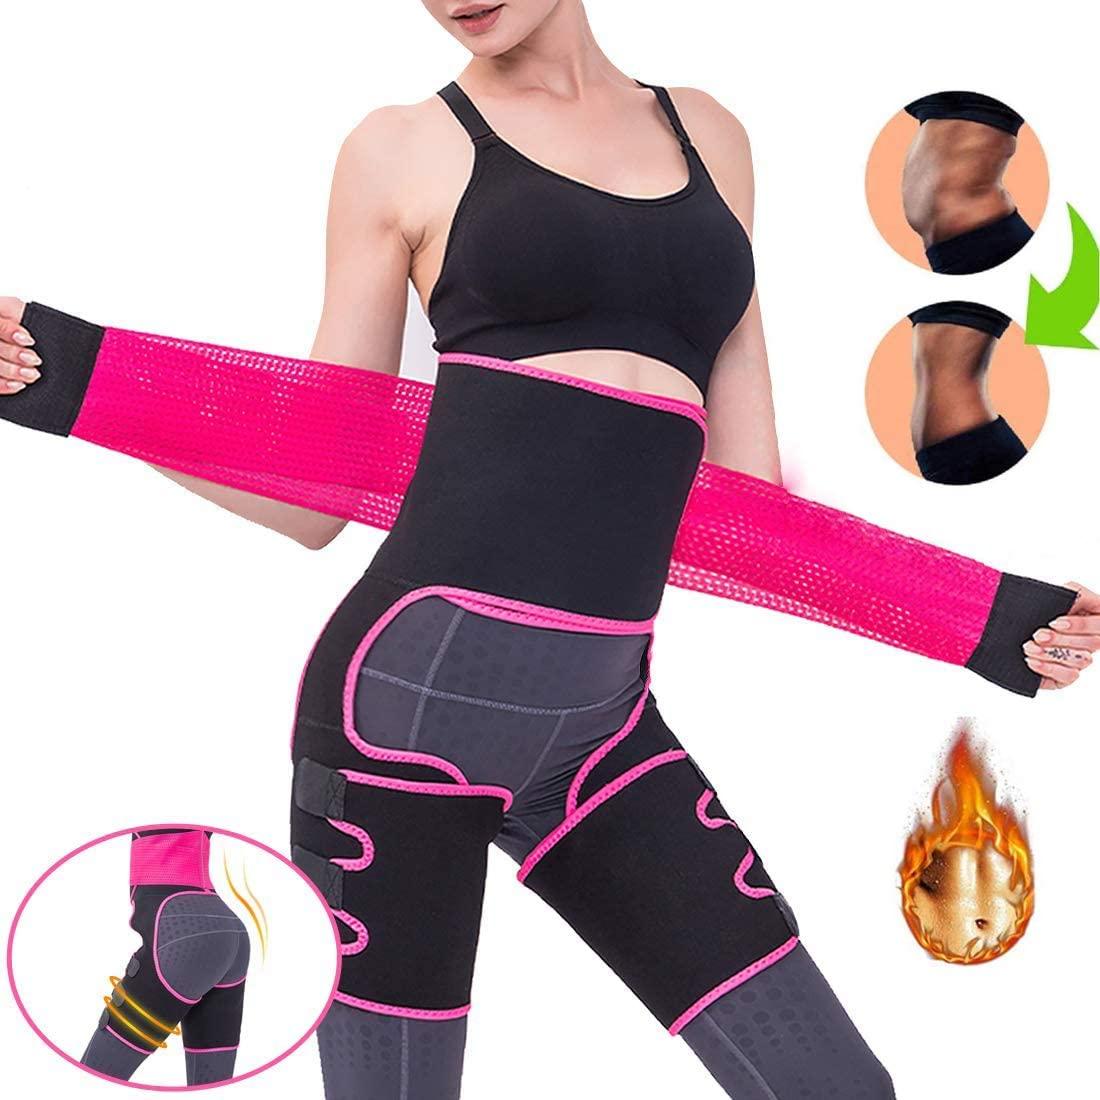 DAWNDEW 2020 Upgraded Waist Trainer for Women, Thigh Trimmer,Fitness Weight Butt Lifter Slimming 3 in 1 Adjustable Hip Enhancer, Hips Belt Trimmer, for Women Body Shaper Workout Fitness Training